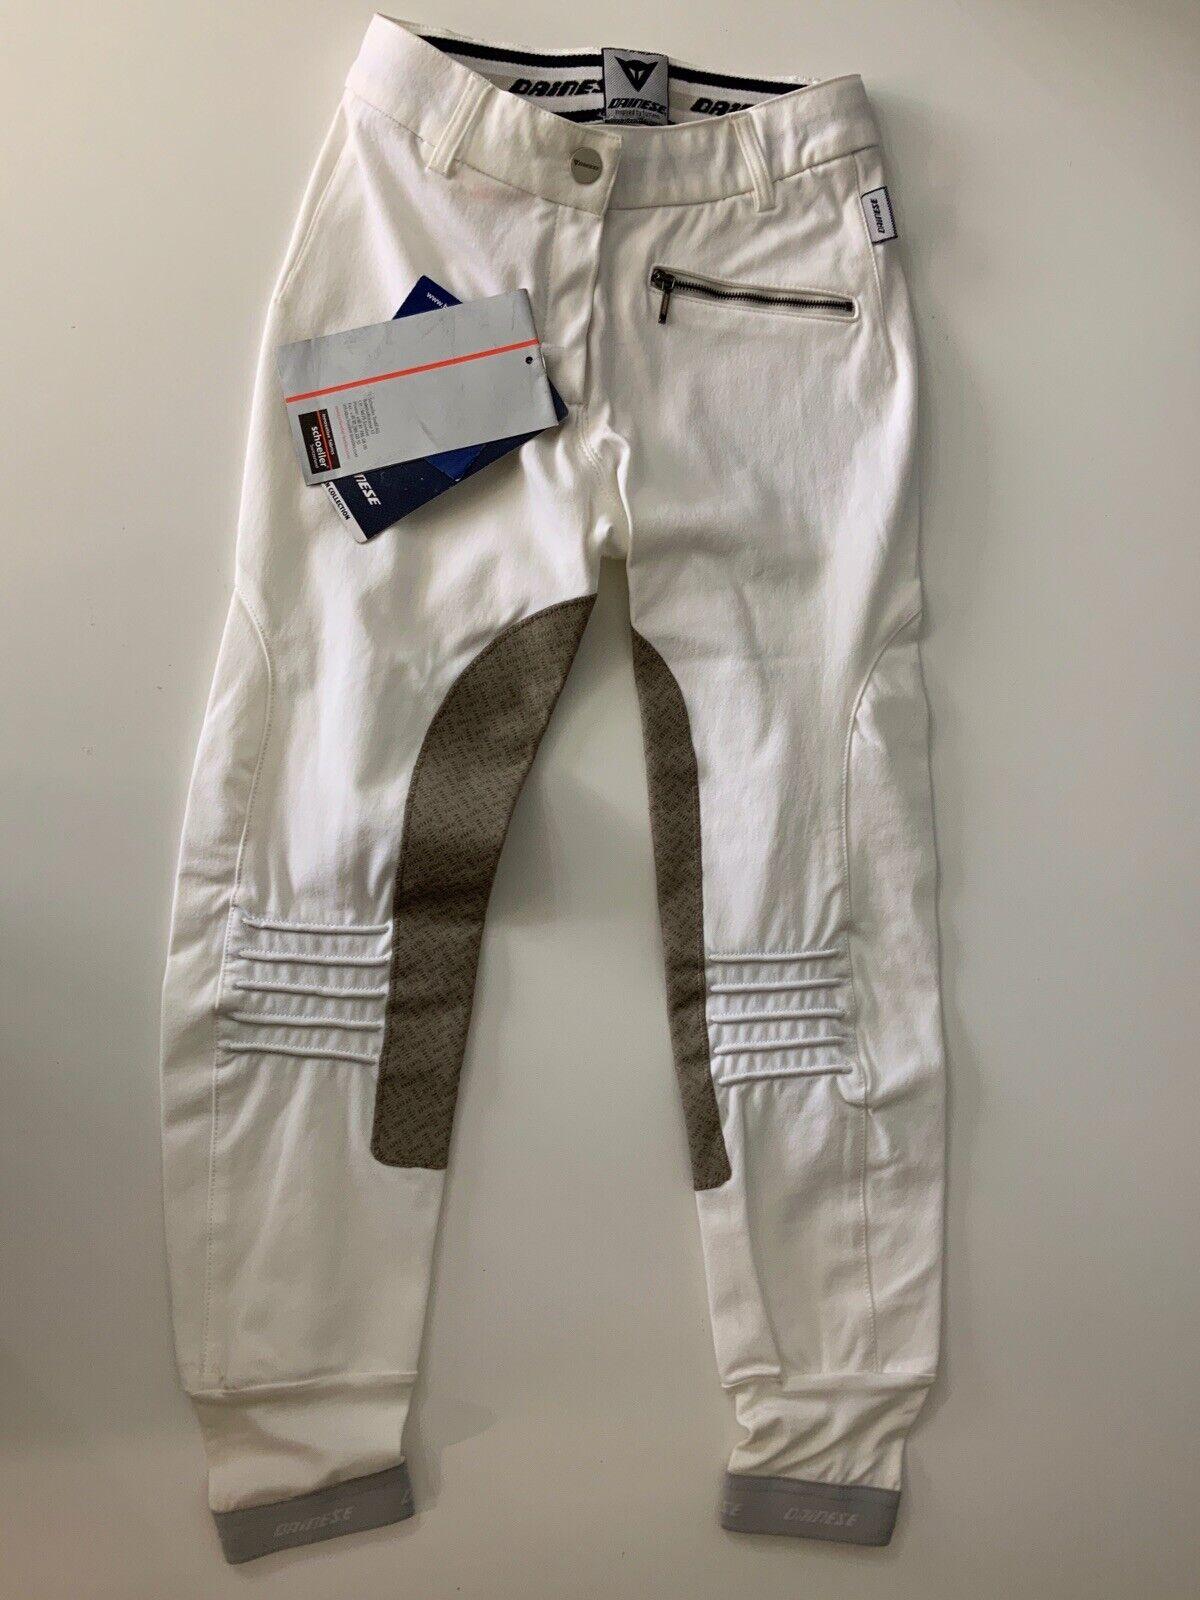 Dainese equestrain nuevo prestigio Pantalones Talla 40 Reino  Unido 8 blancoo Puro Pantalones  envío gratuito a nivel mundial